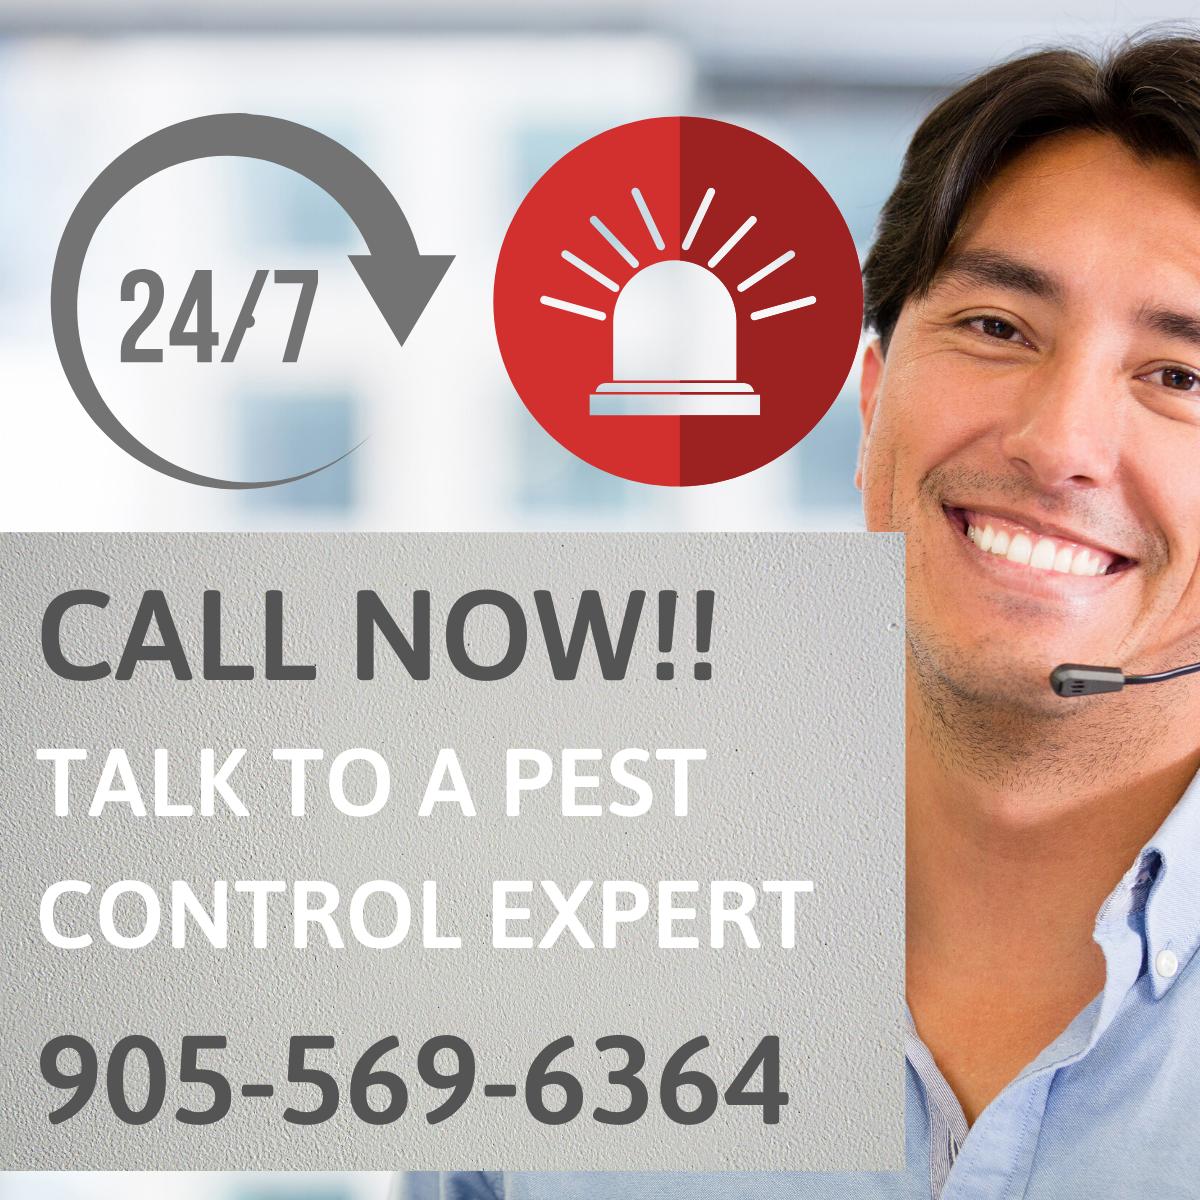 Orbis Pest Control Emergency Services